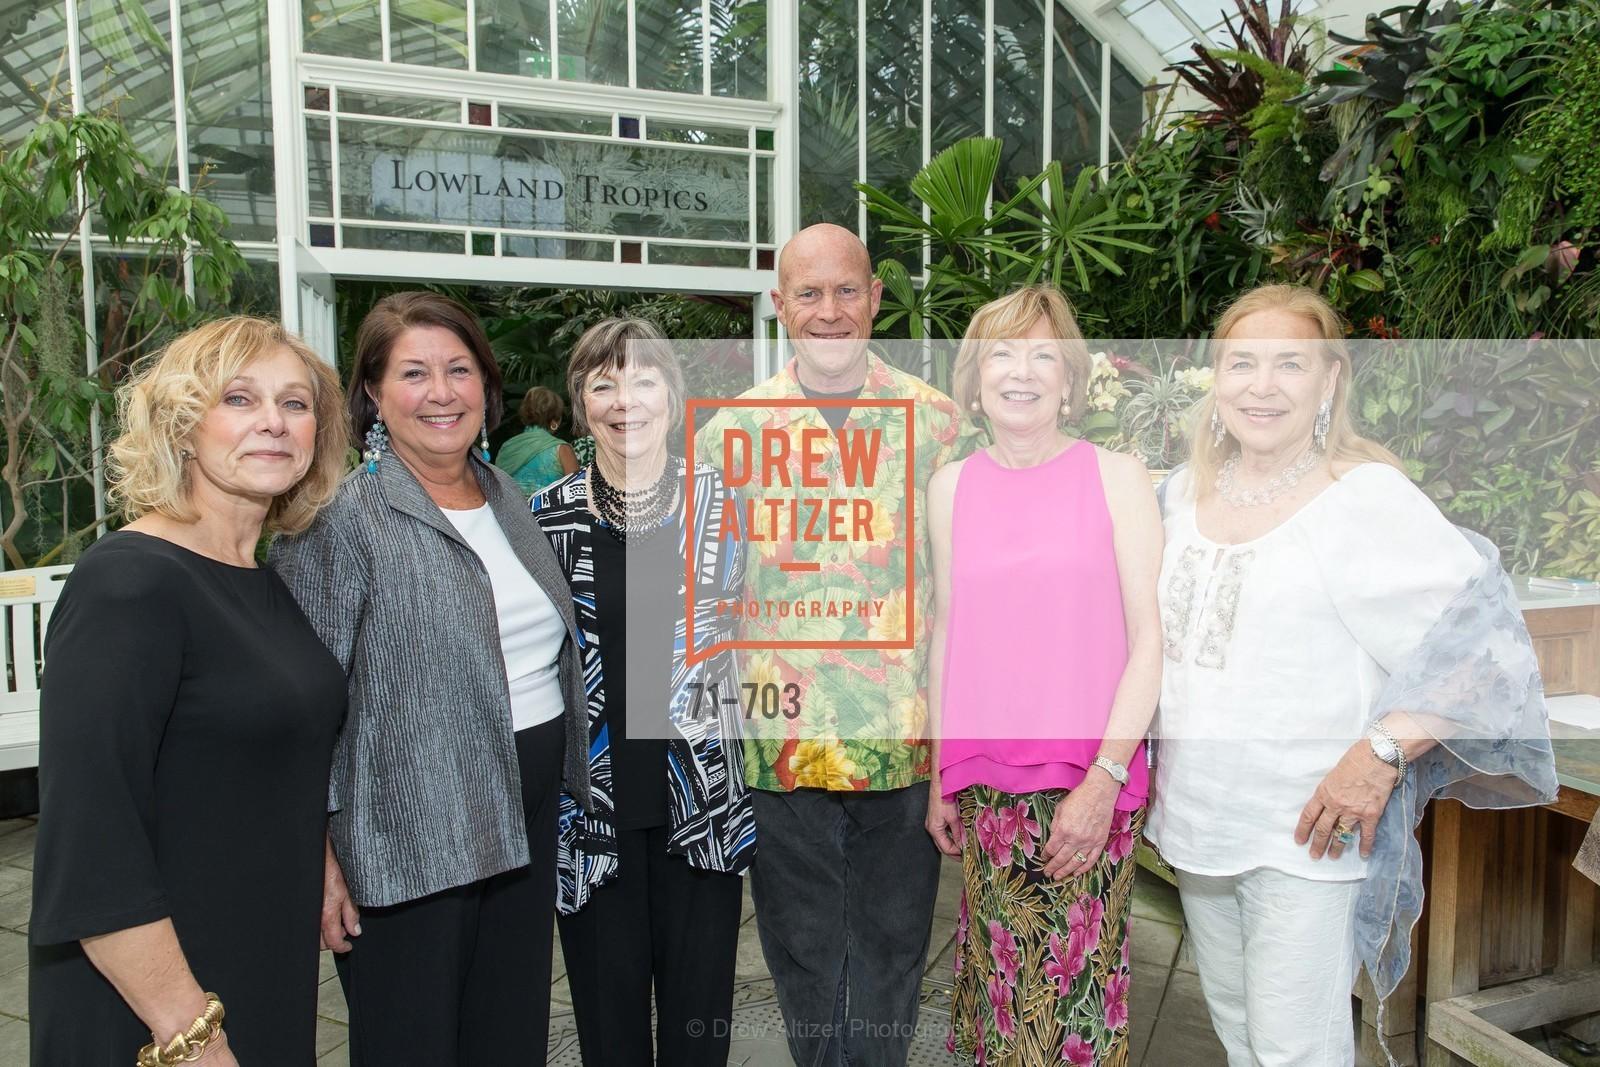 Sharon Collier, Terry Dolan, Donna Ellis, Steven Brown, Jane Scurich, Natasha Hopkinson, CONSERVATORY OF FLOWERS Presents